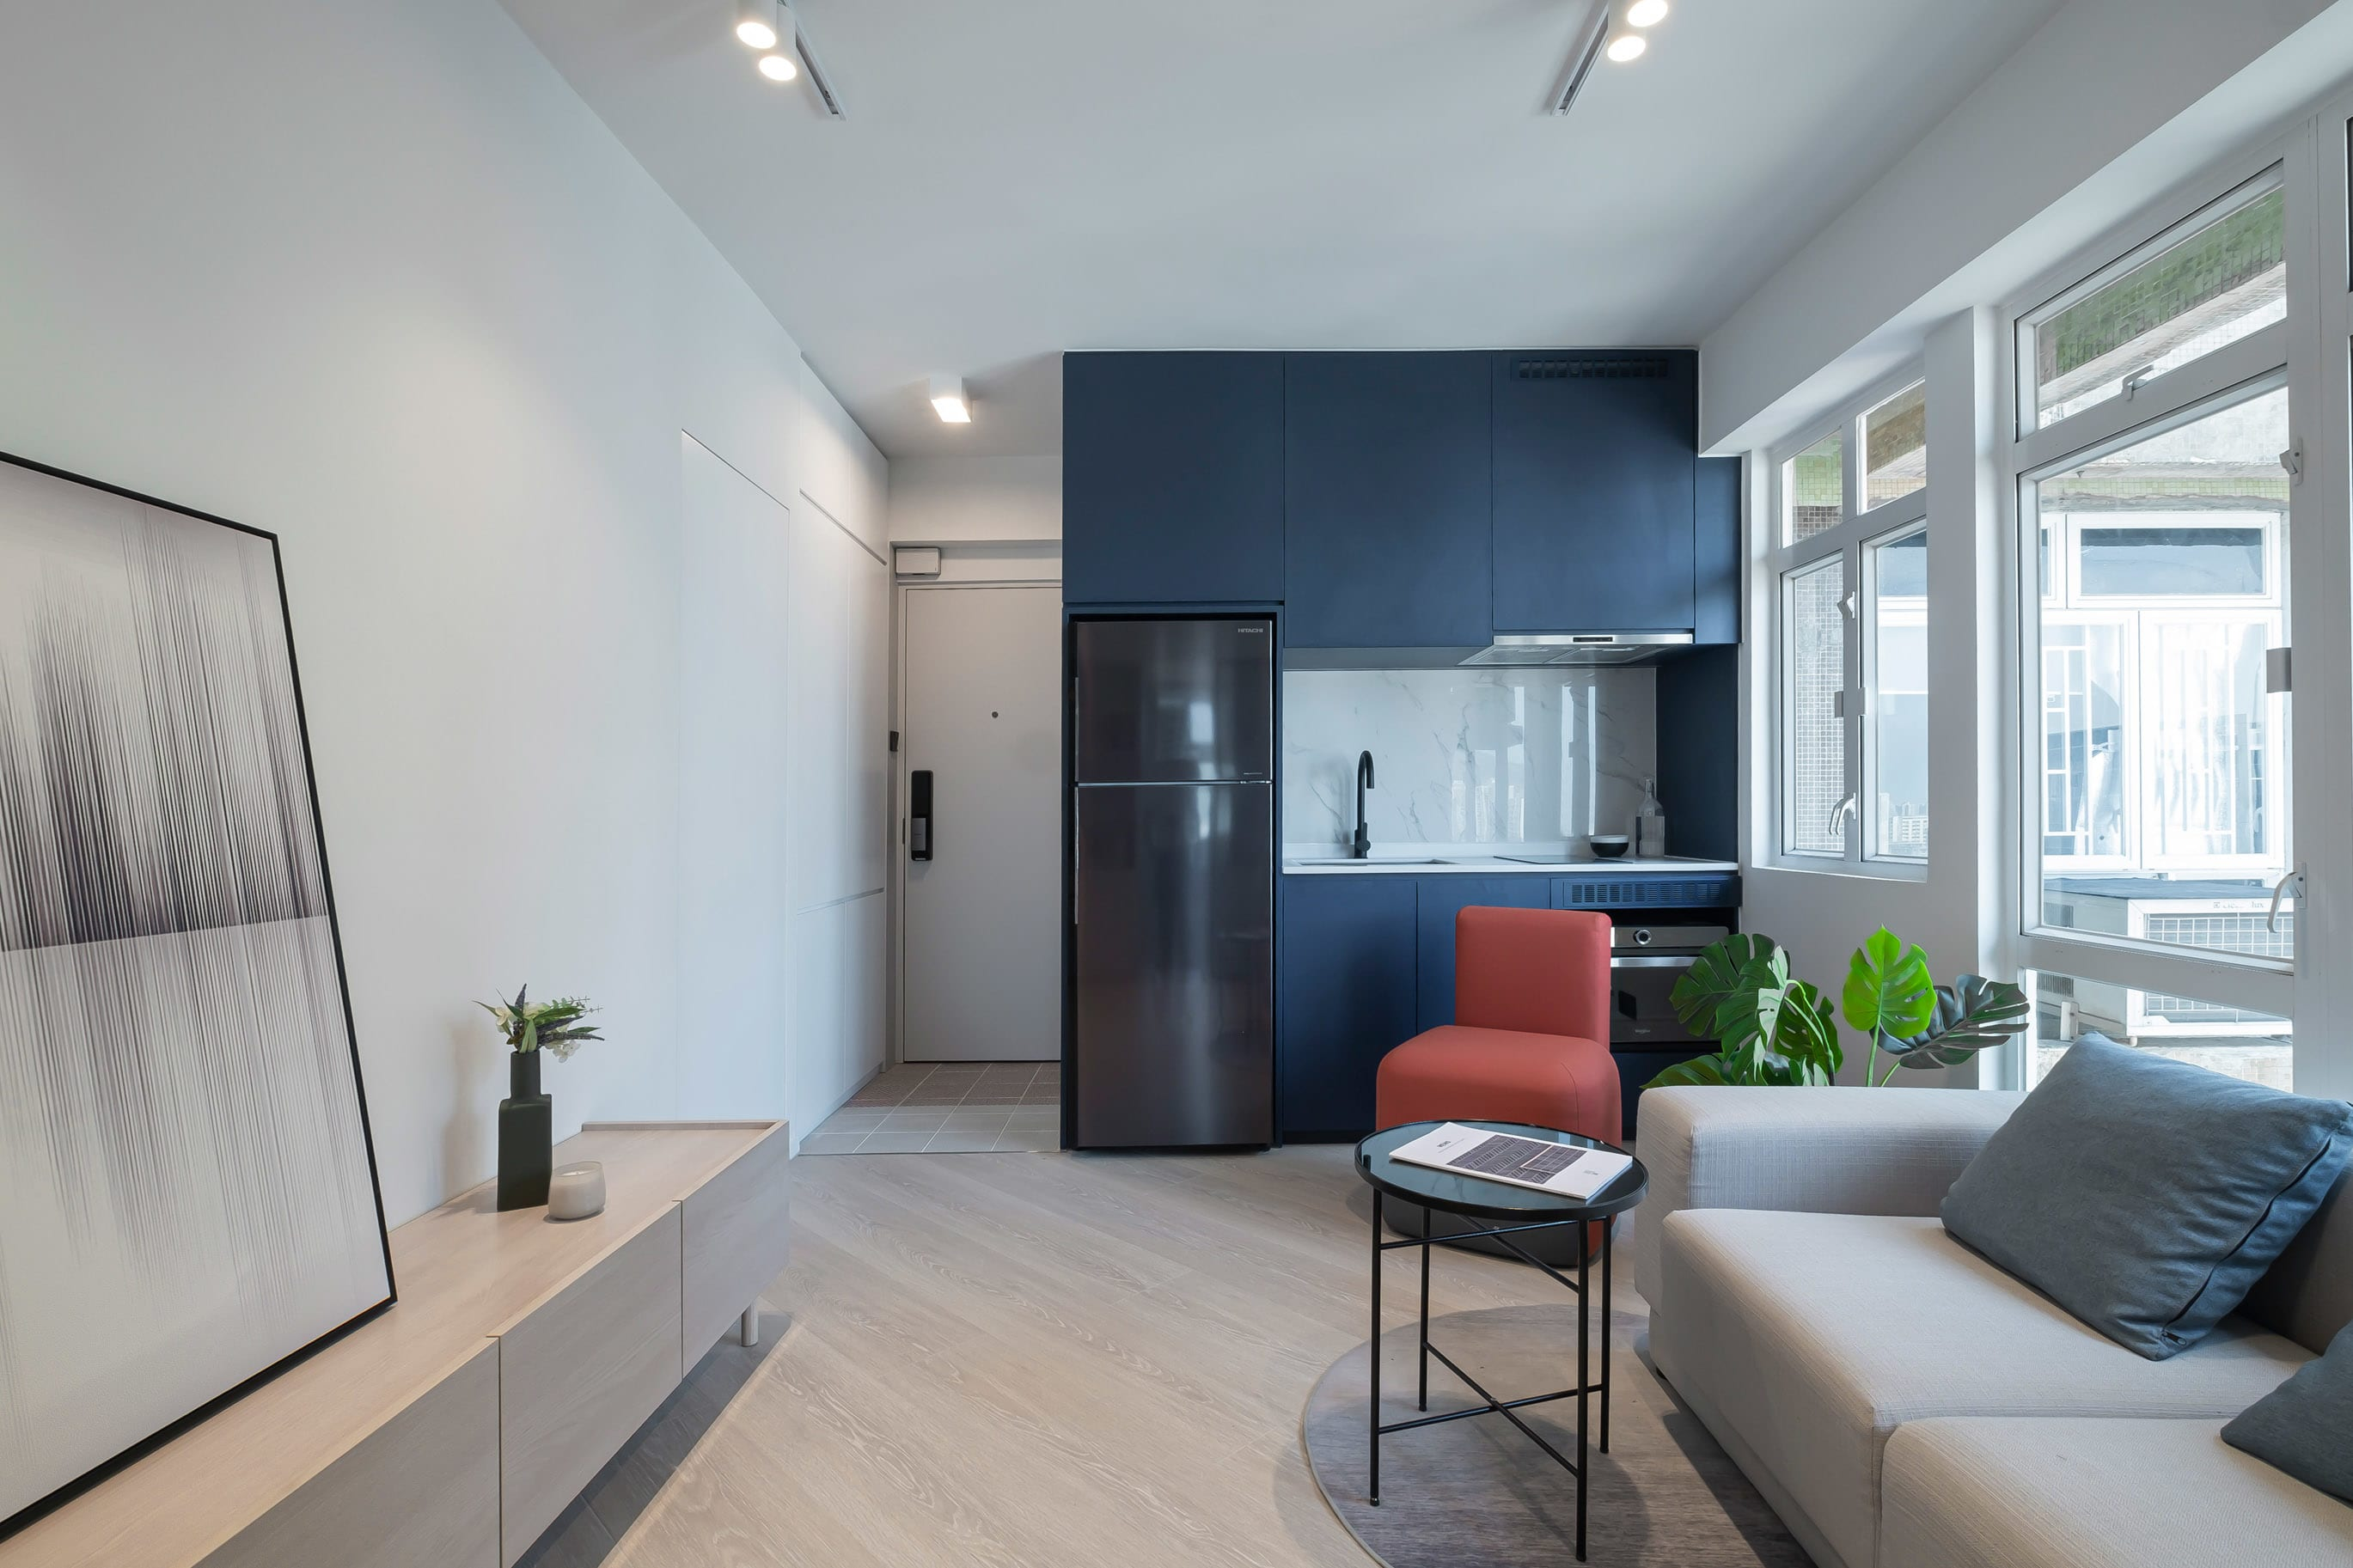 https://res.cloudinary.com/www-designidk-com/image/upload/v1627366105/articles/8918/Waldorf-Garden-zinc-studio-interior_4_sqemm6.jpg